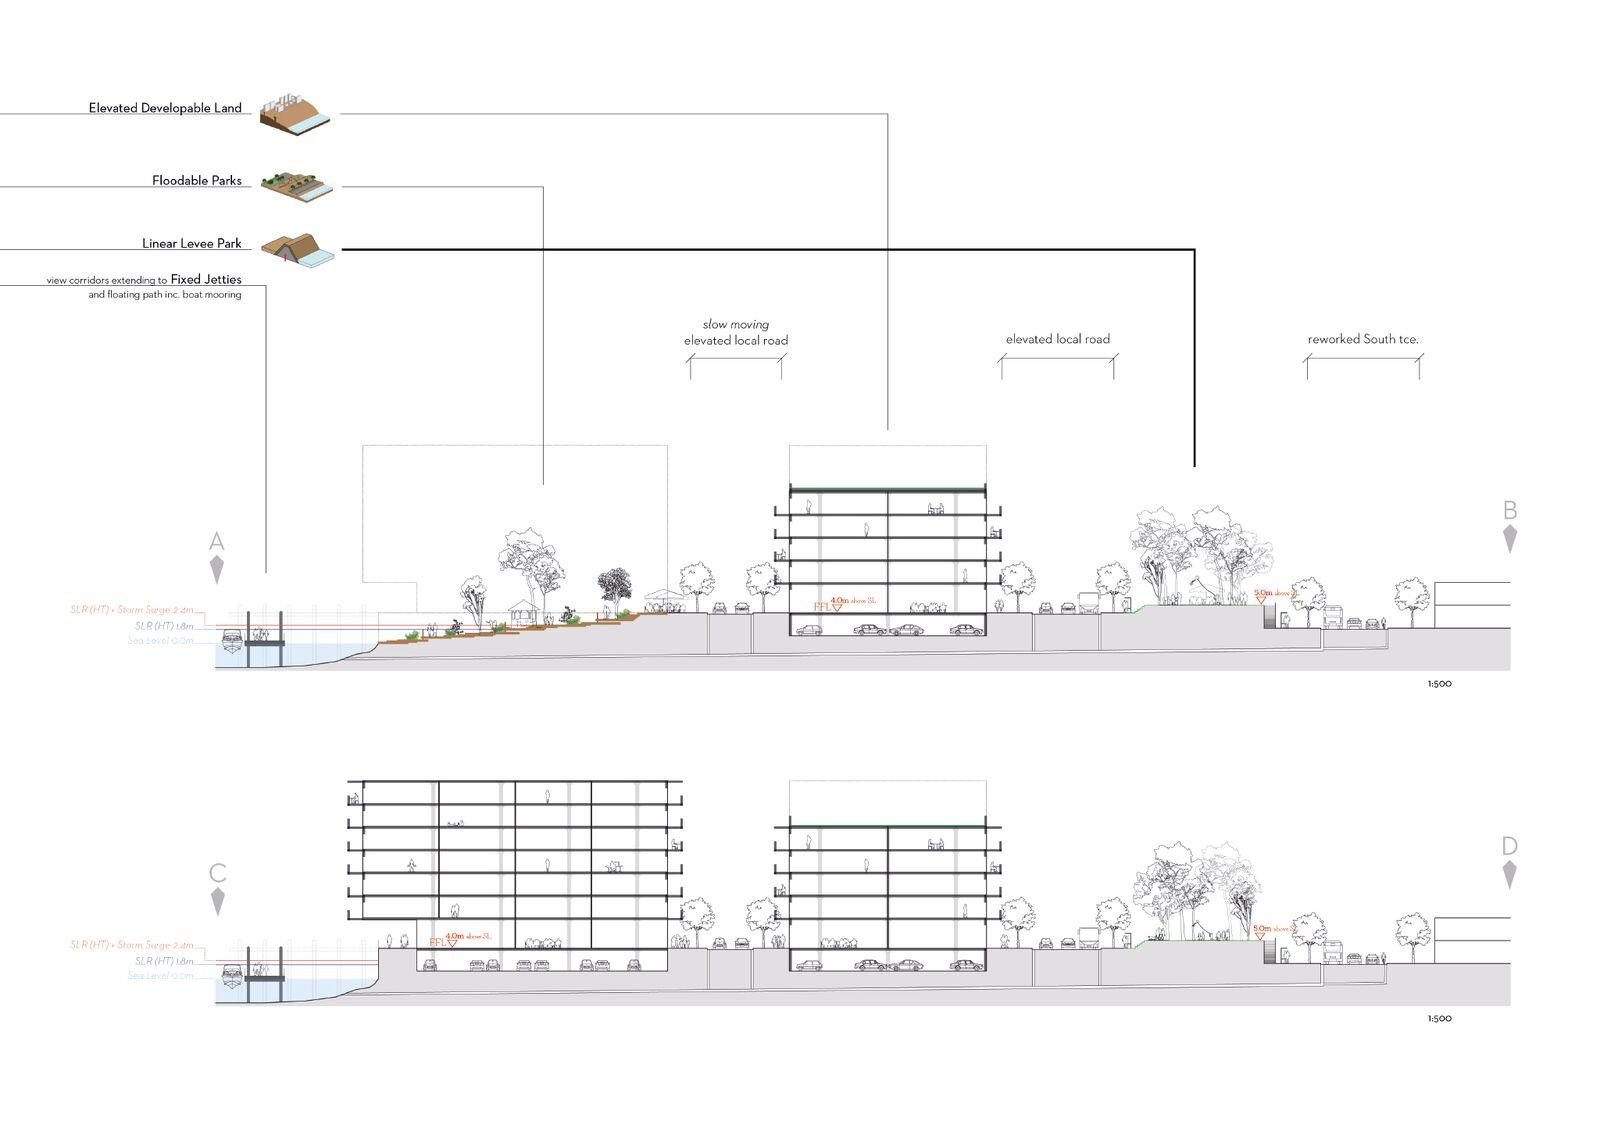 Gareth Ringrose. Master of Urban Design Thesis. 2014. Sections.